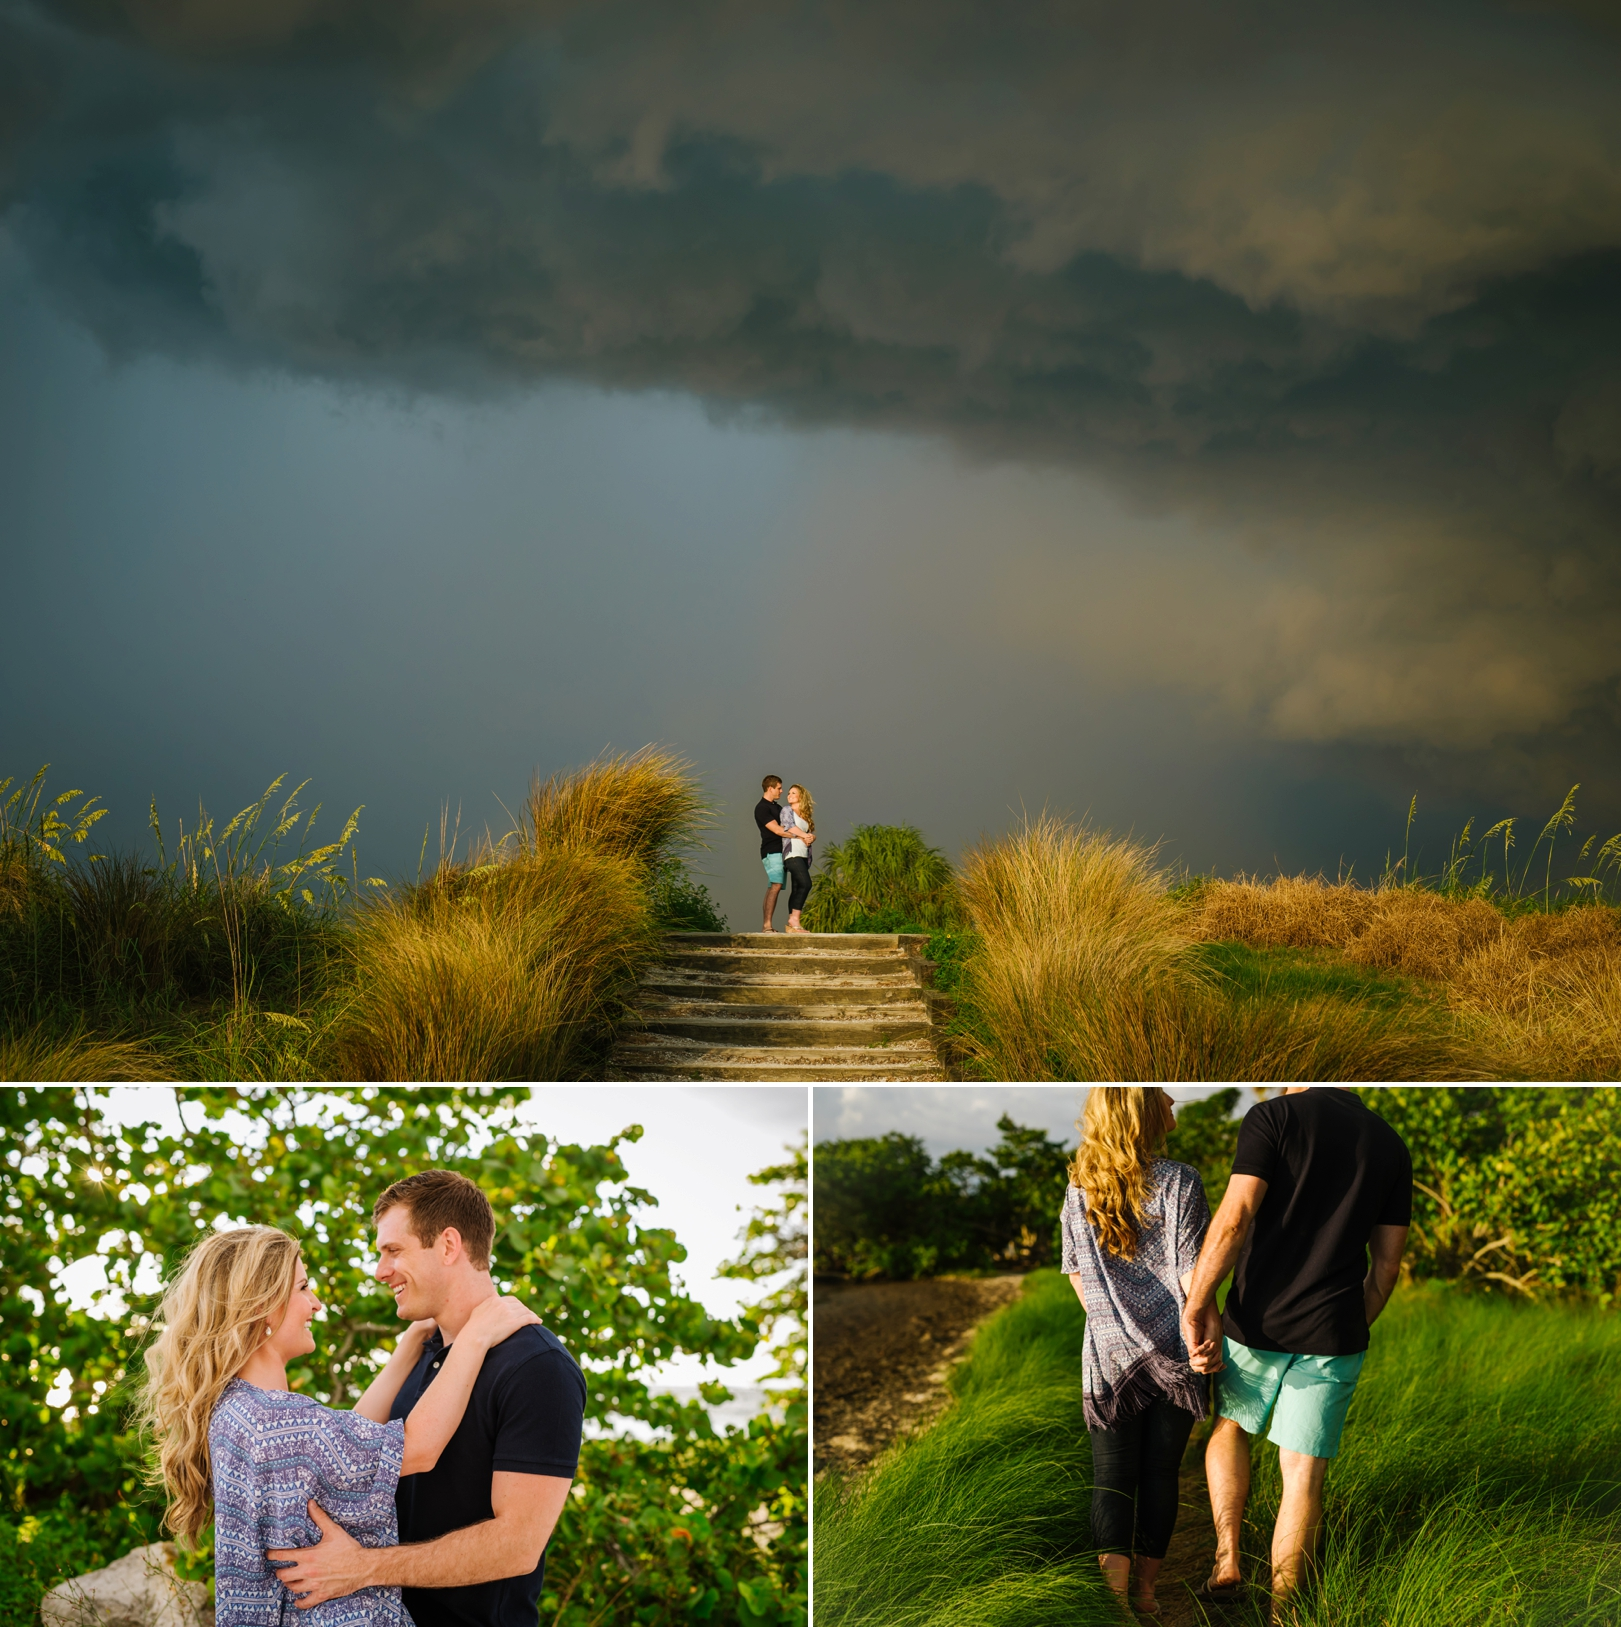 tampa-wedding-photographer-engagement-nature-outdoor-florida_0006.jpg